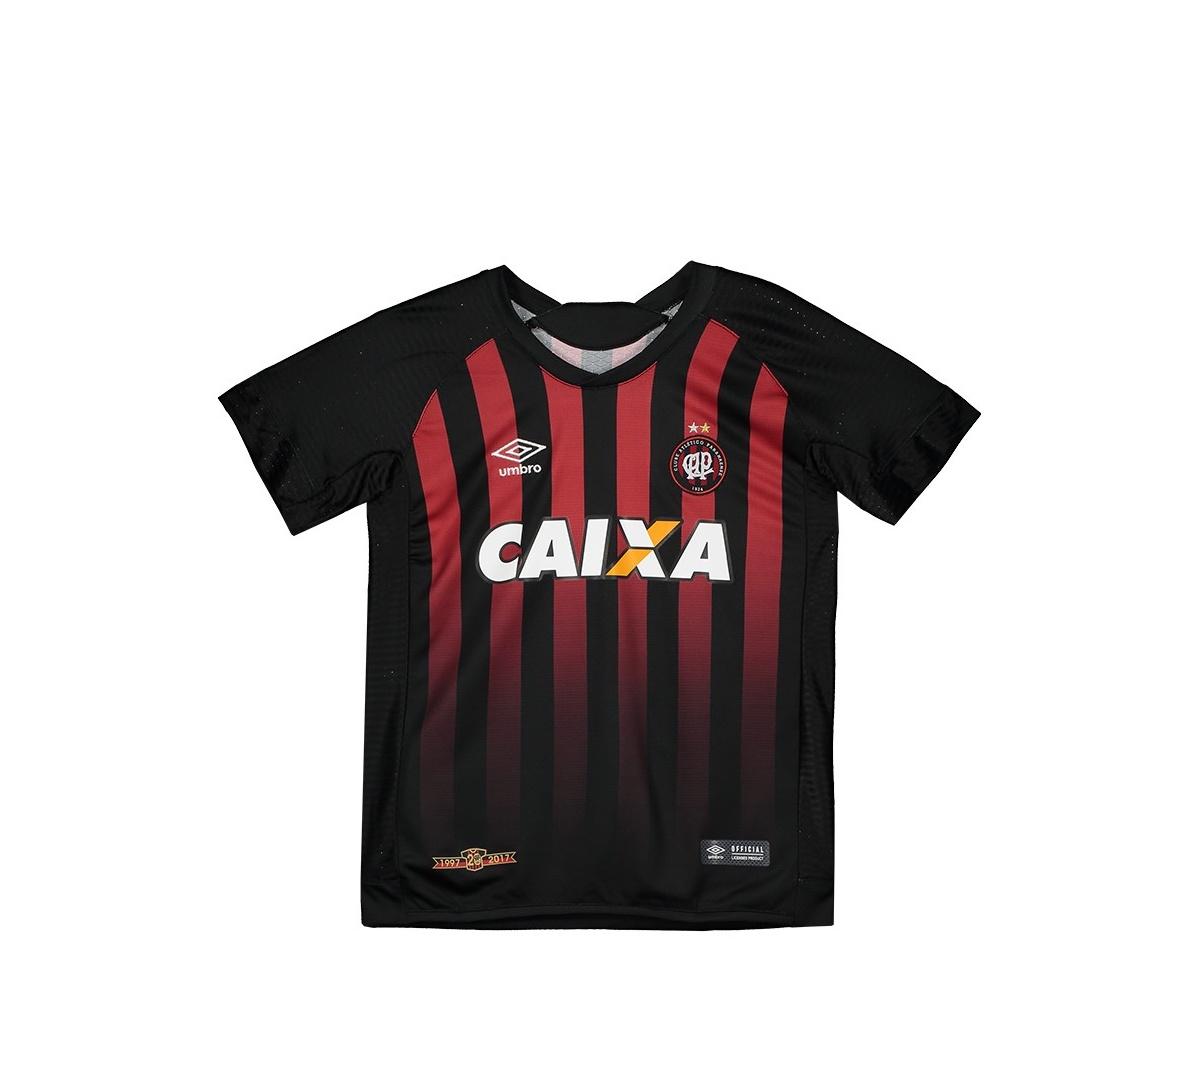 Camisa Atlético Paranaense I Umbro Juvenil 17/18